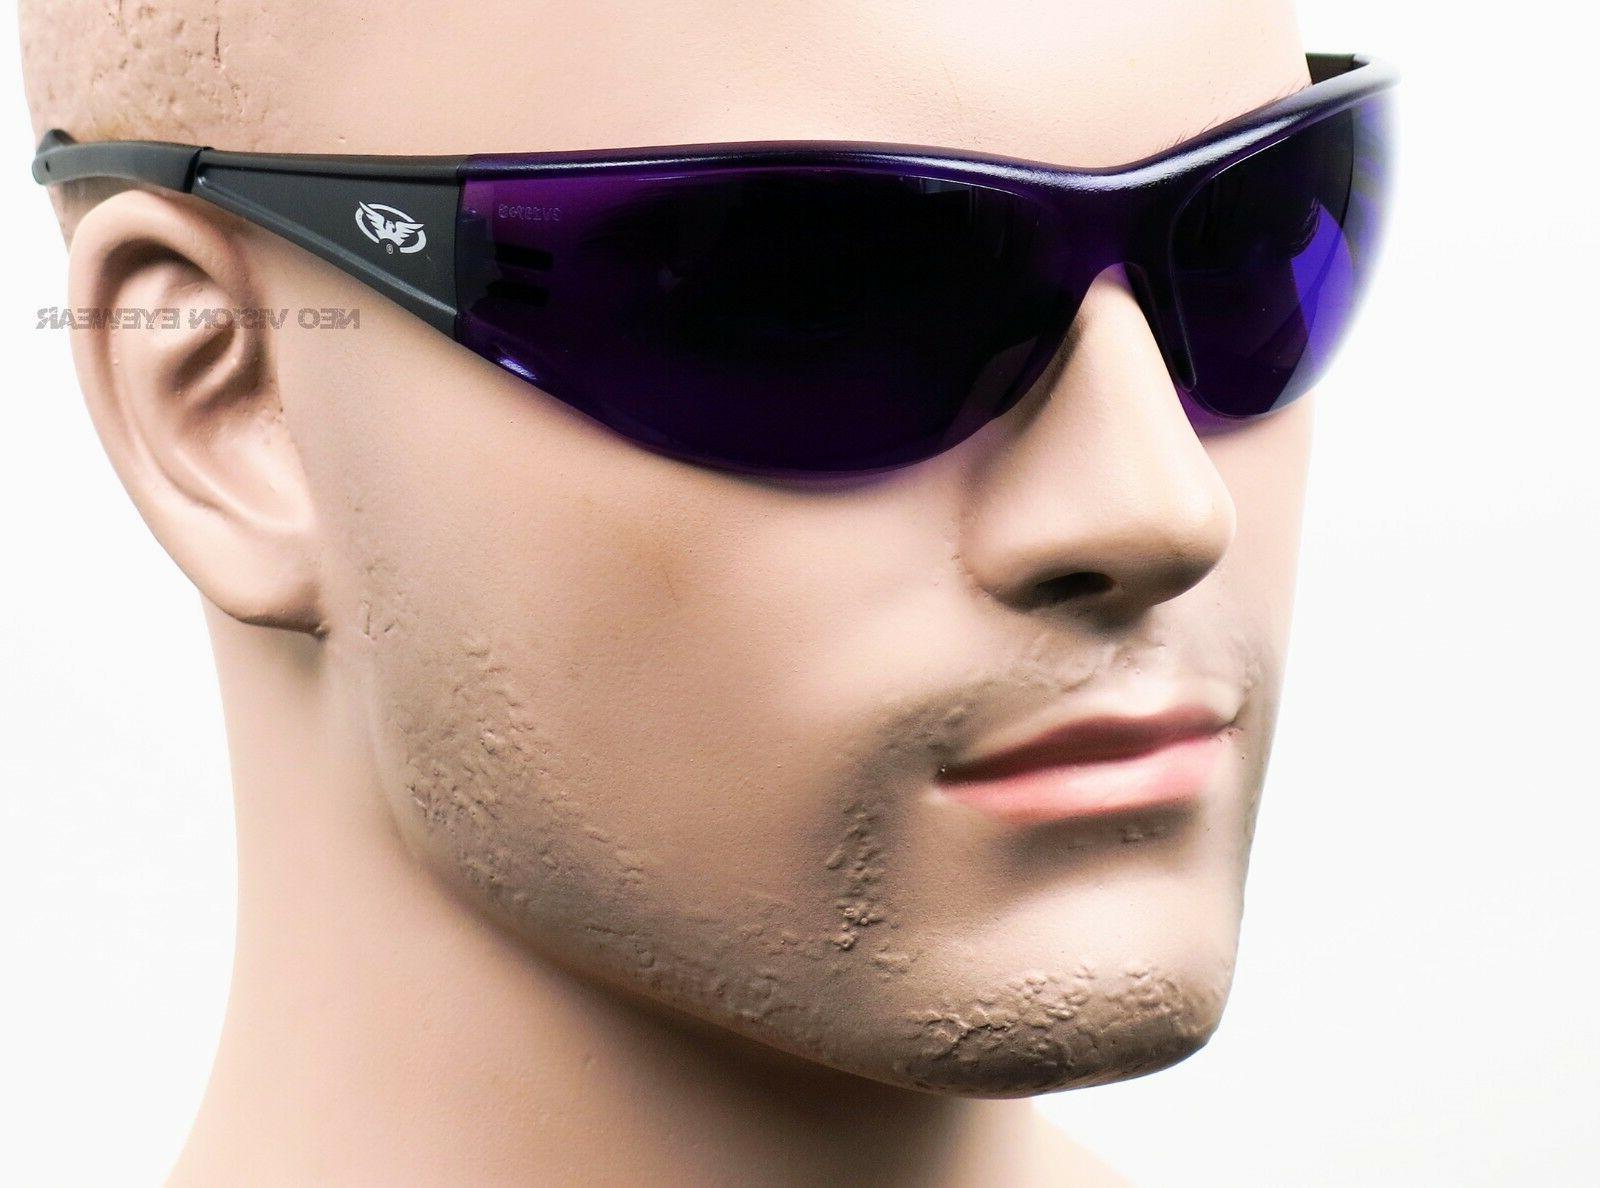 Global Purple Lens Safety Glasses Sunglasses